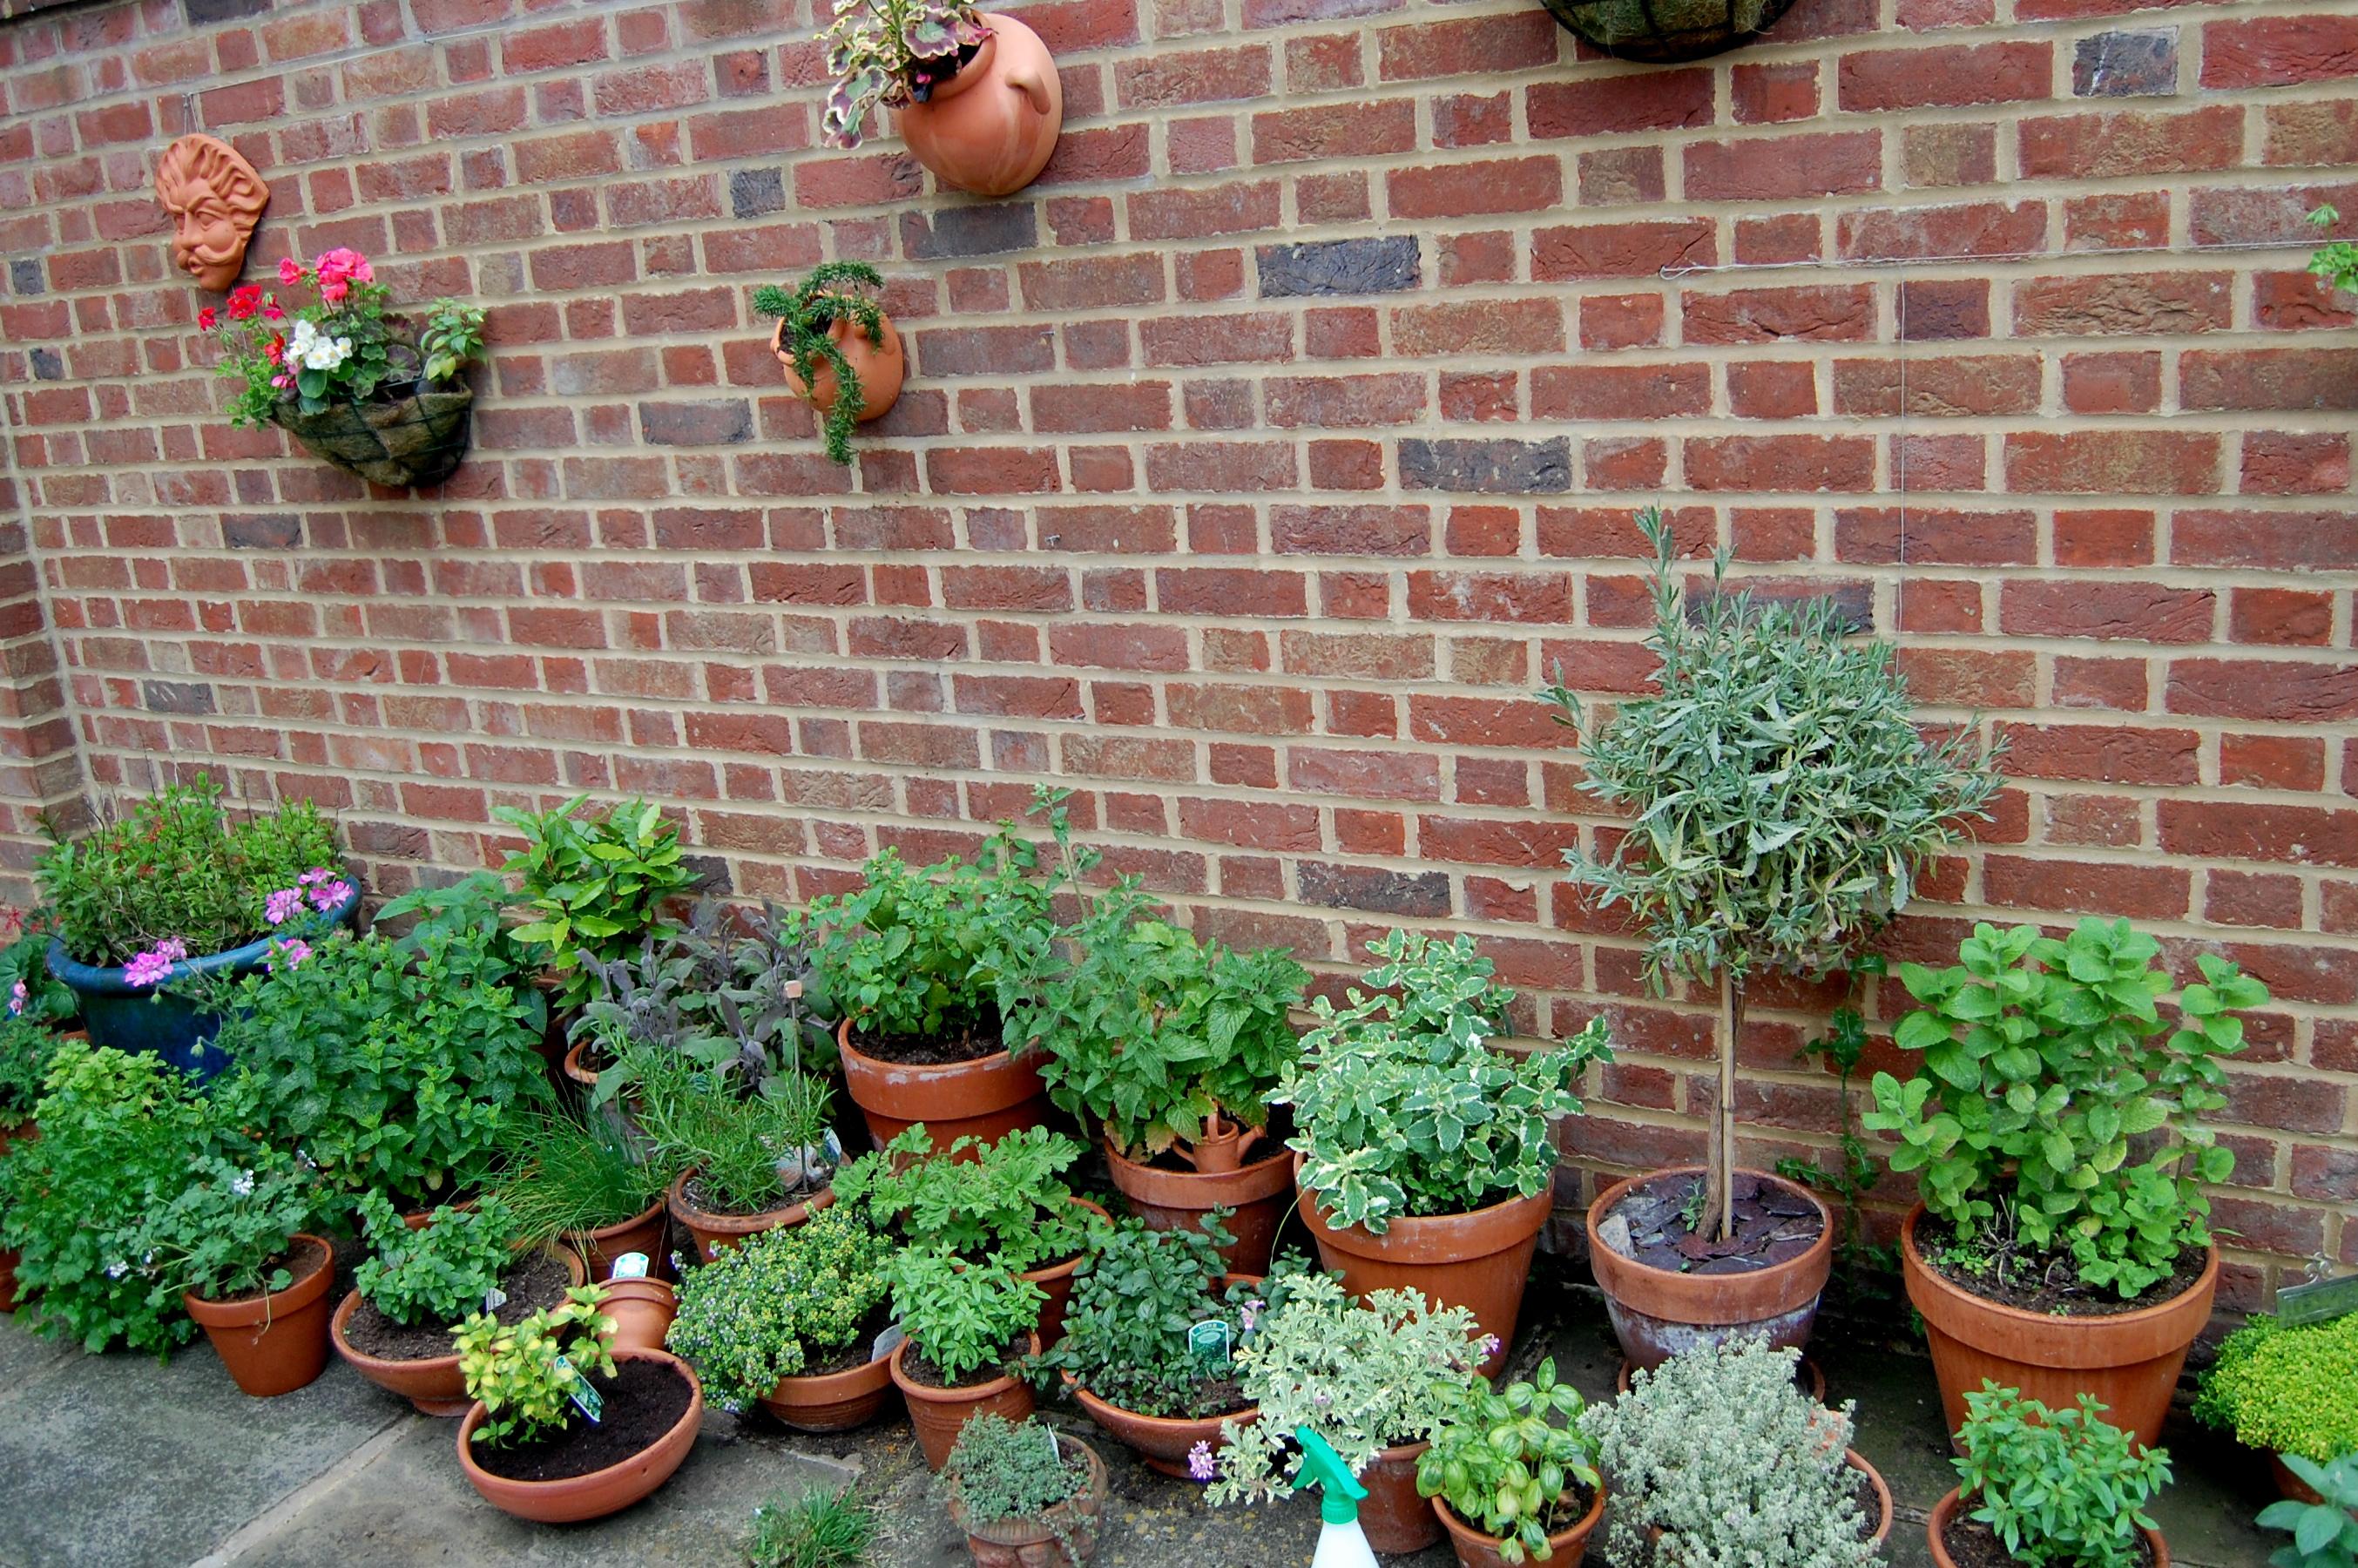 Part of the herb garden